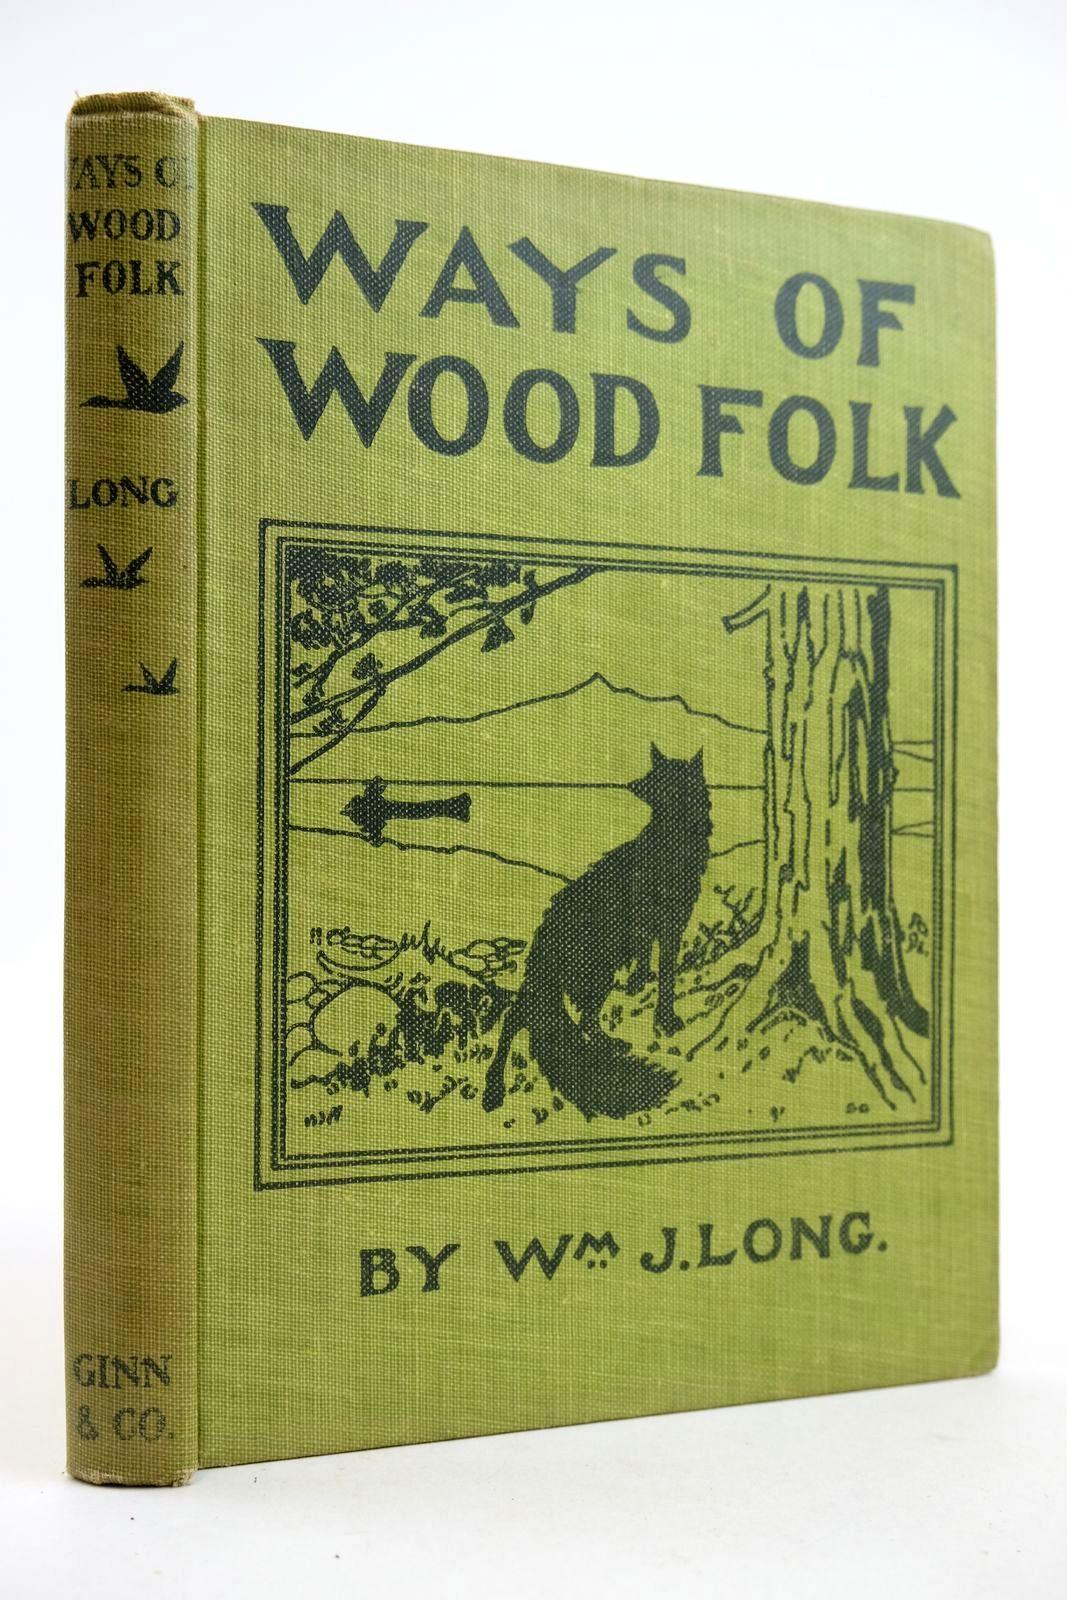 Photo of WAYS OF WOOD FOLK- Stock Number: 2132749